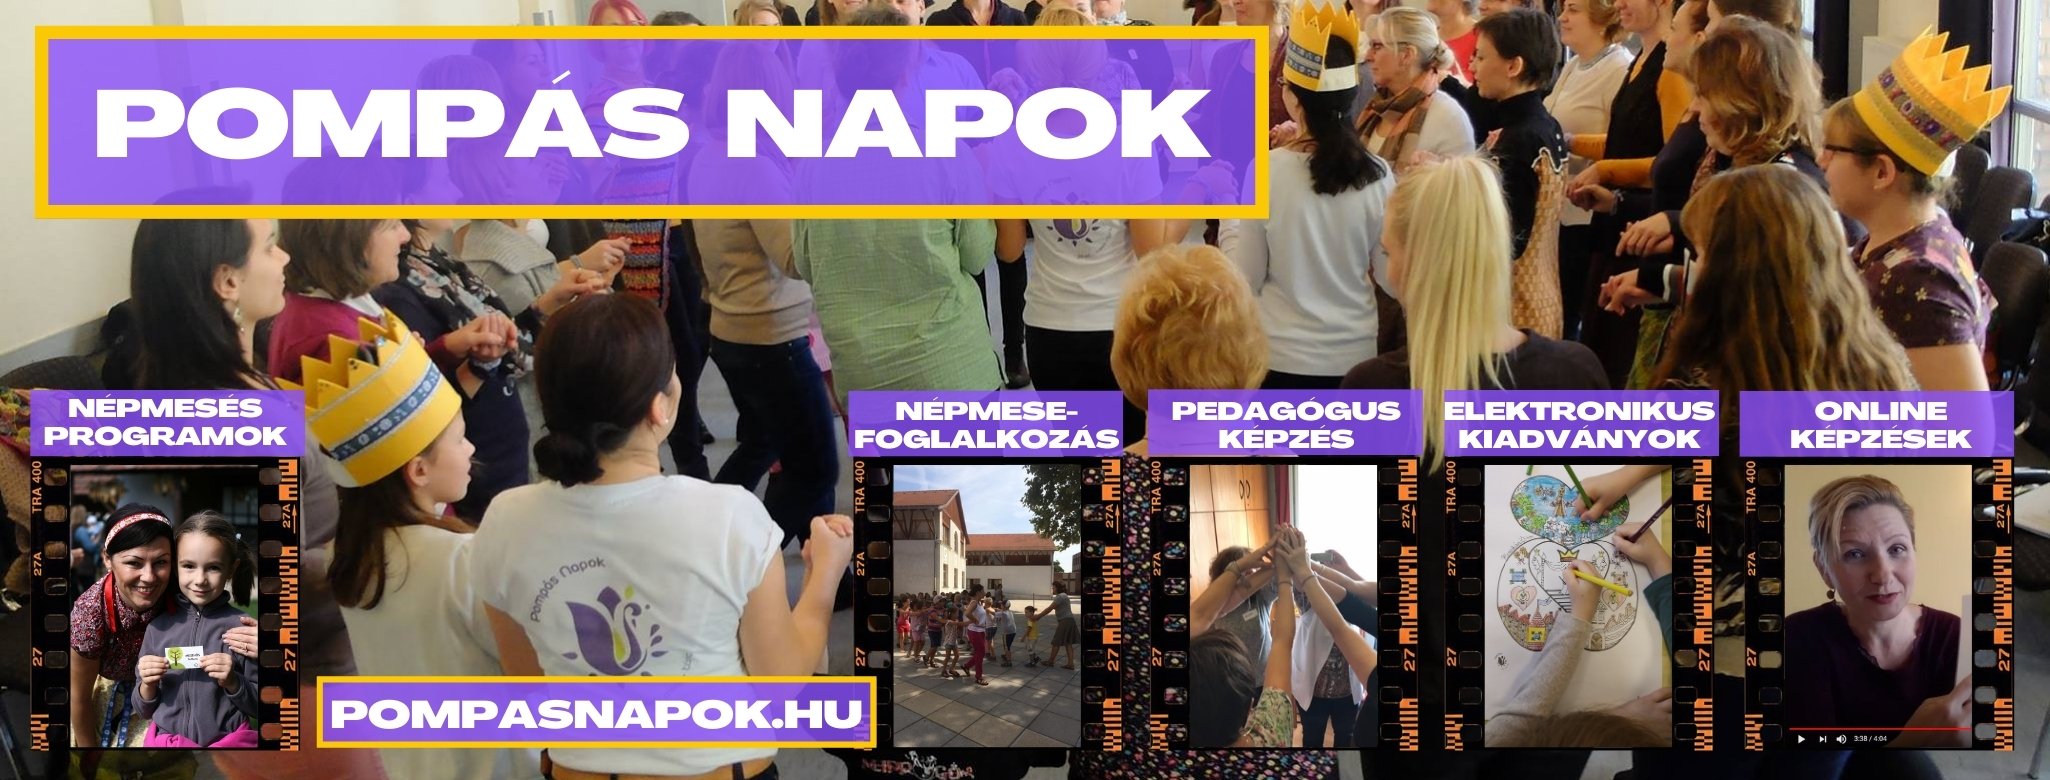 pompasnapok_hu.jpg